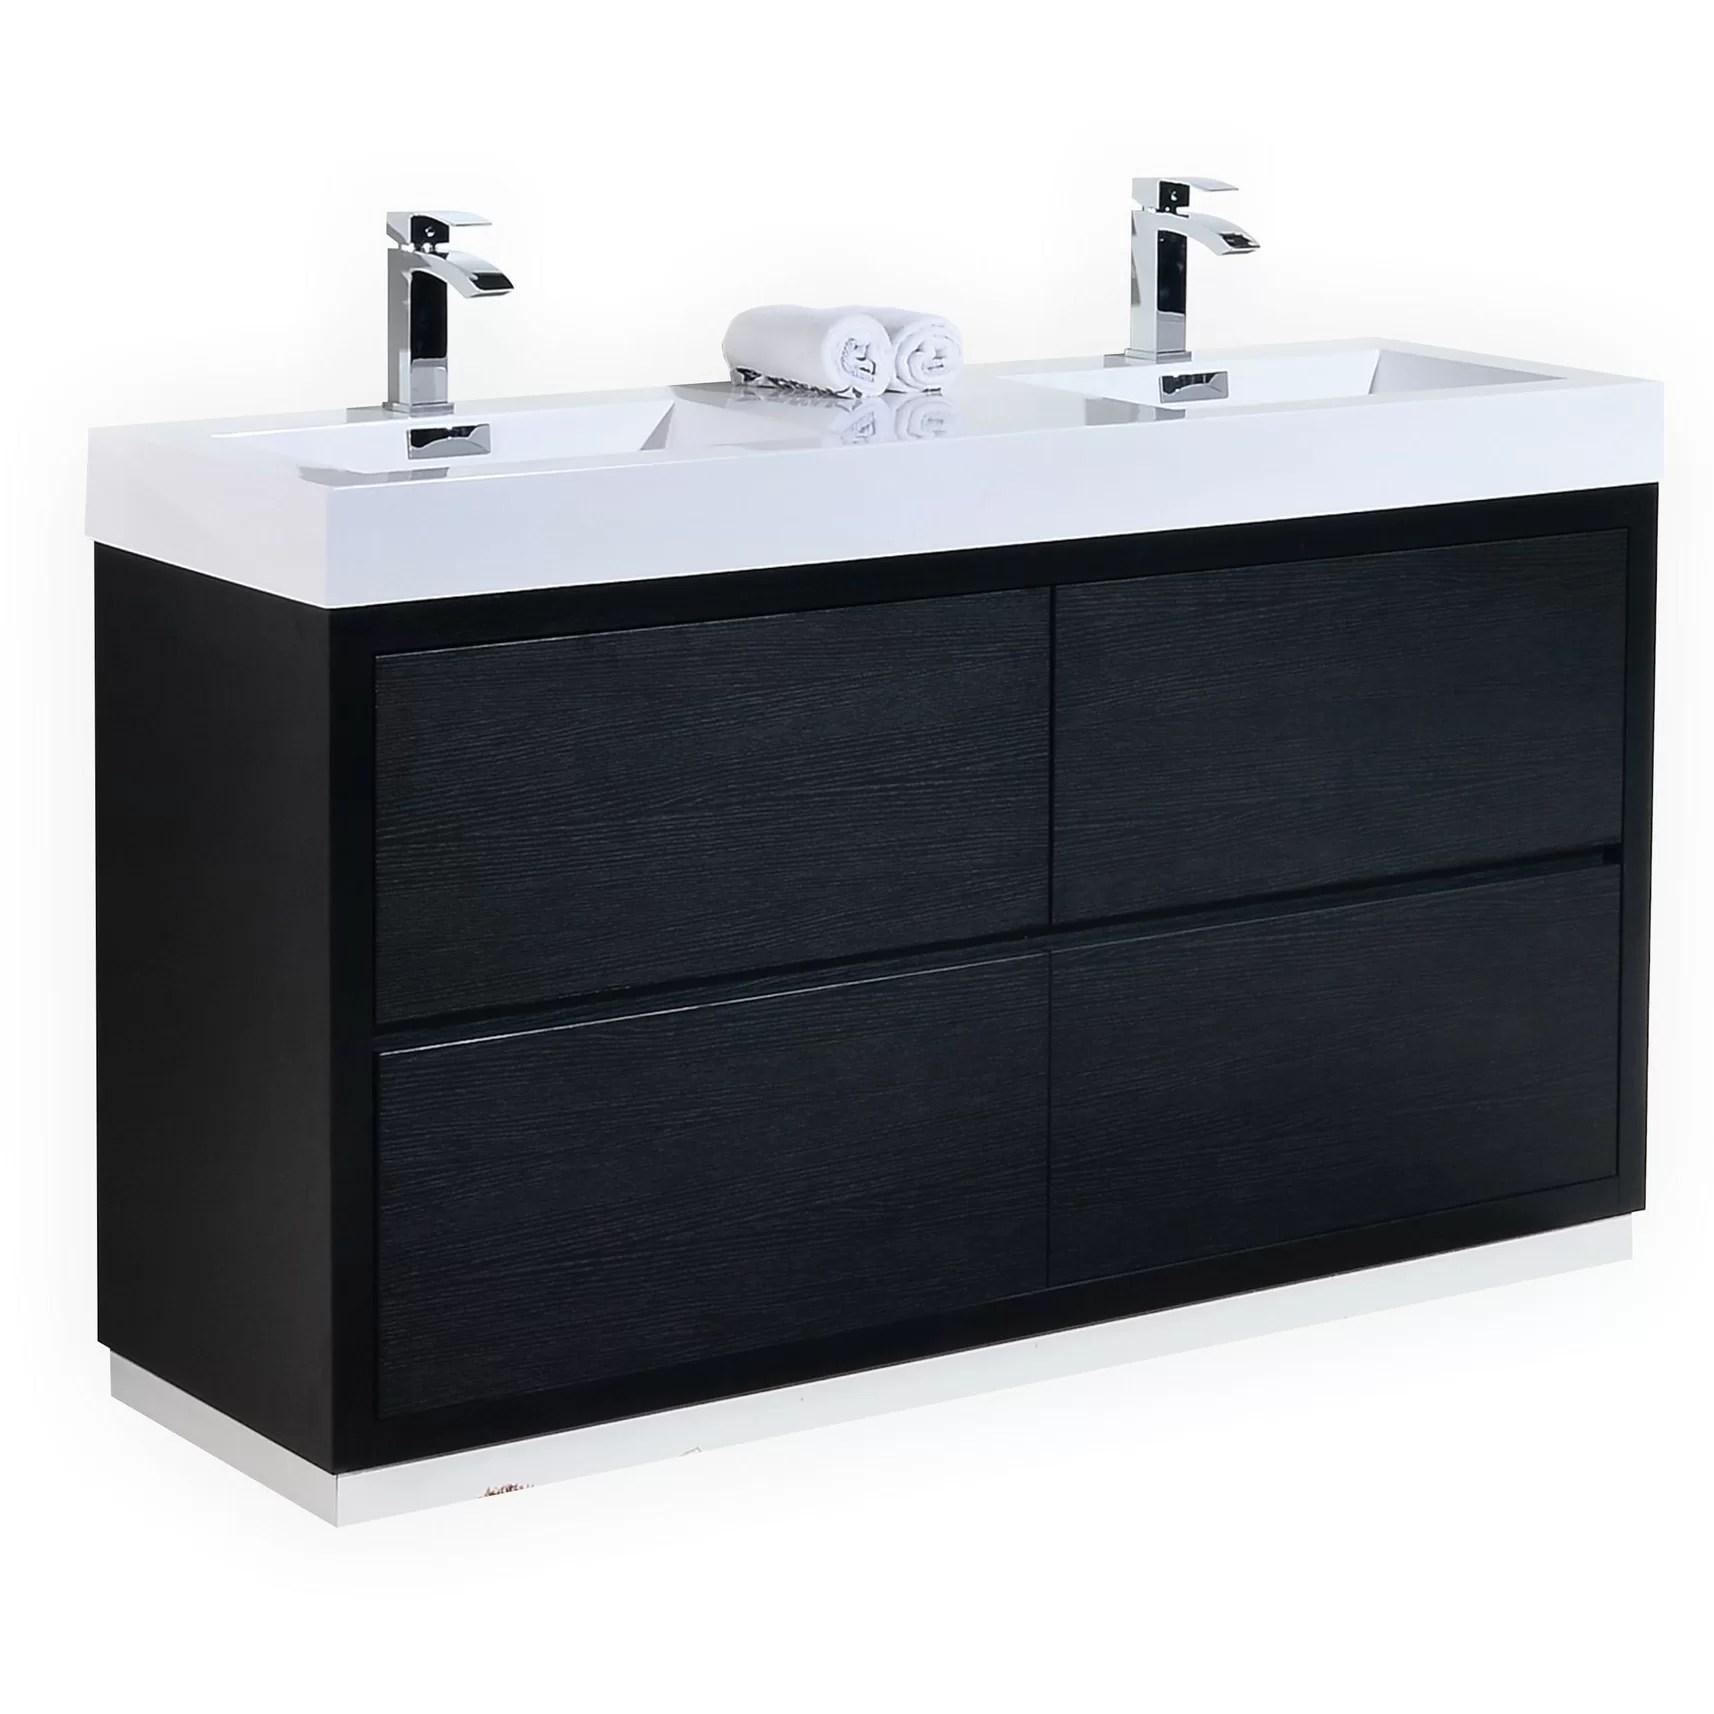 Kube Bath Bliss 60 Double Free Standing Modern Bathroom